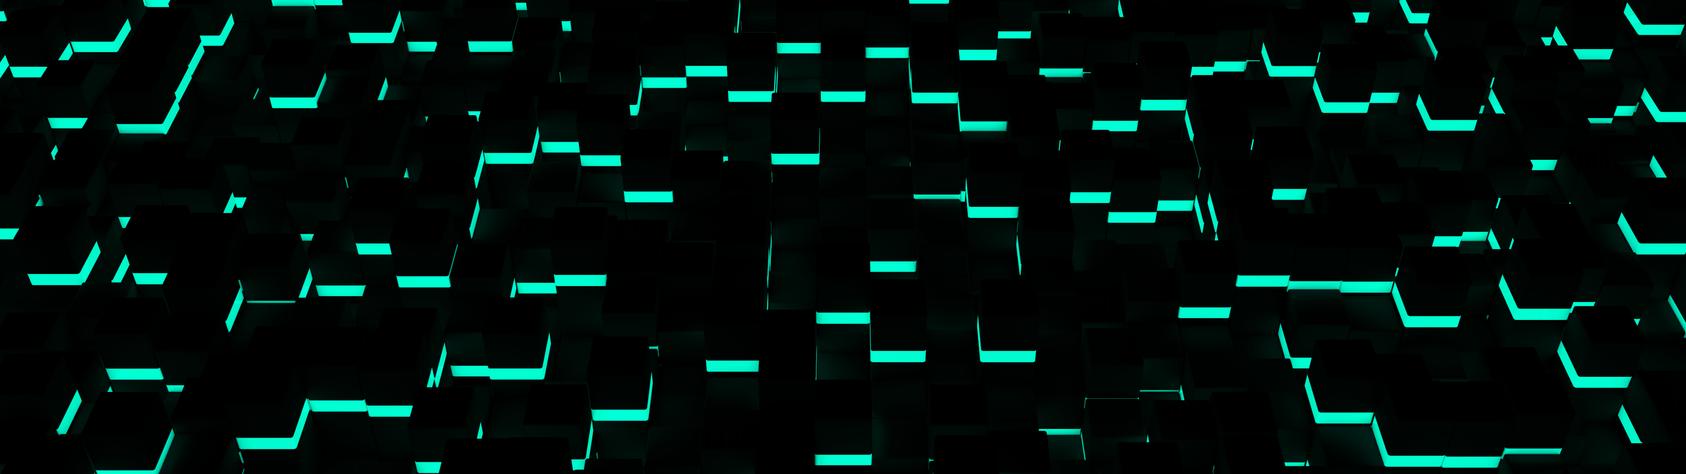 randube free dual screen wallpaper 3840x1080 by xlife